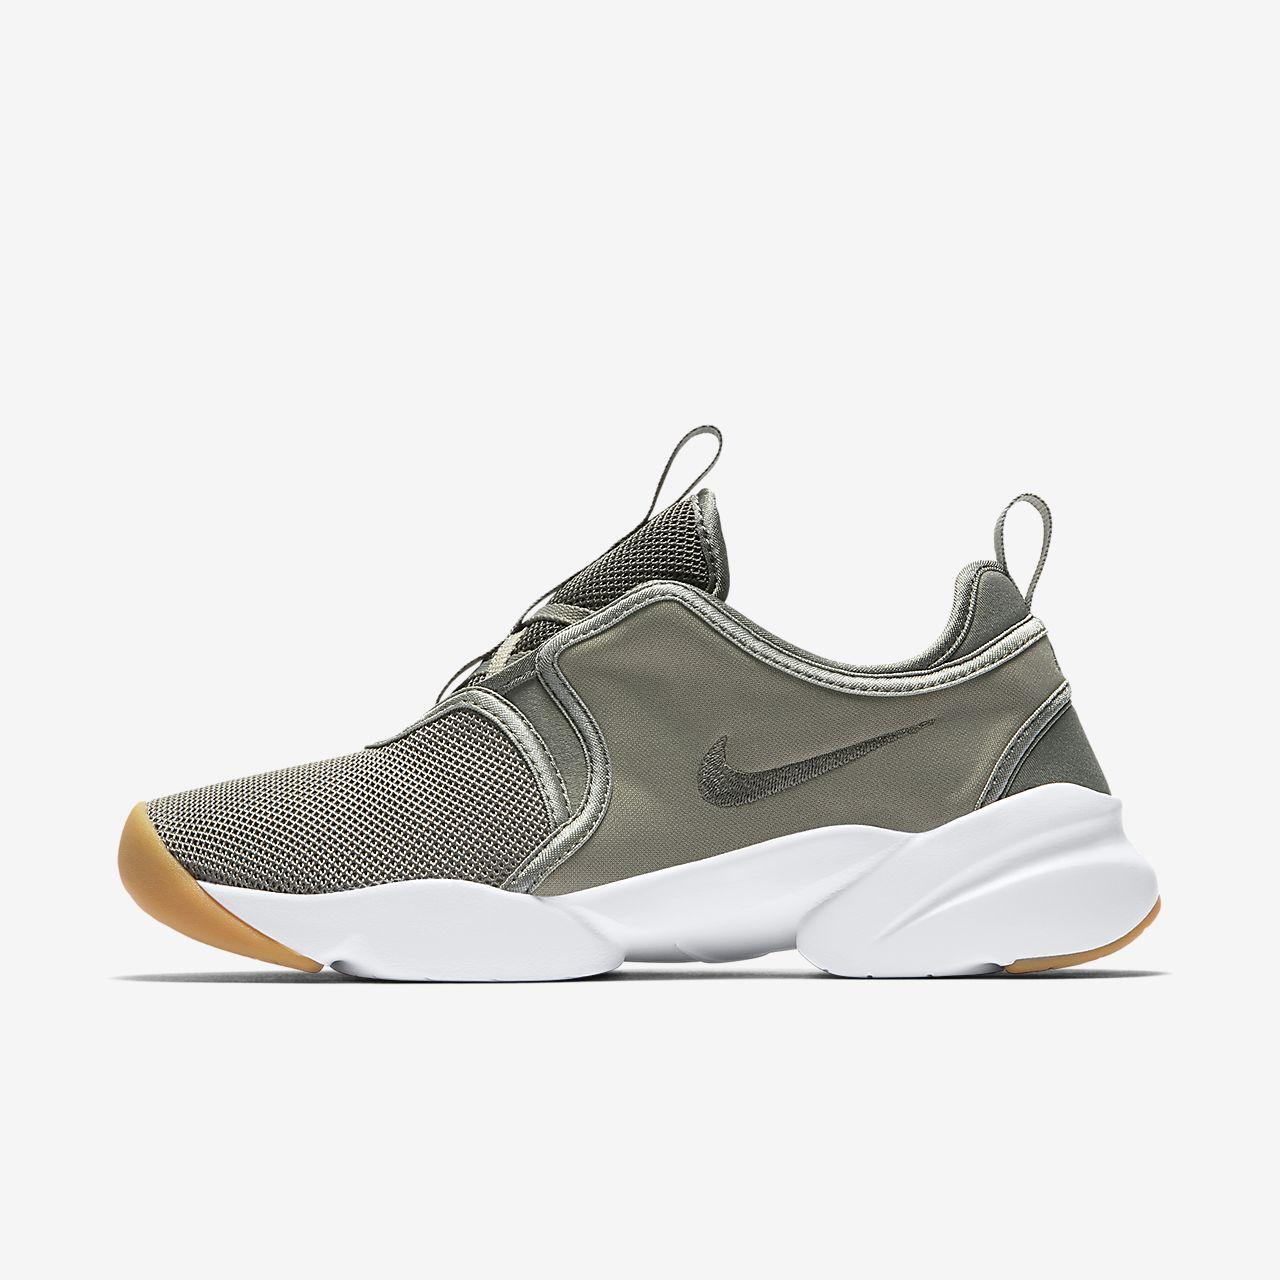 Nike Loden - I4842